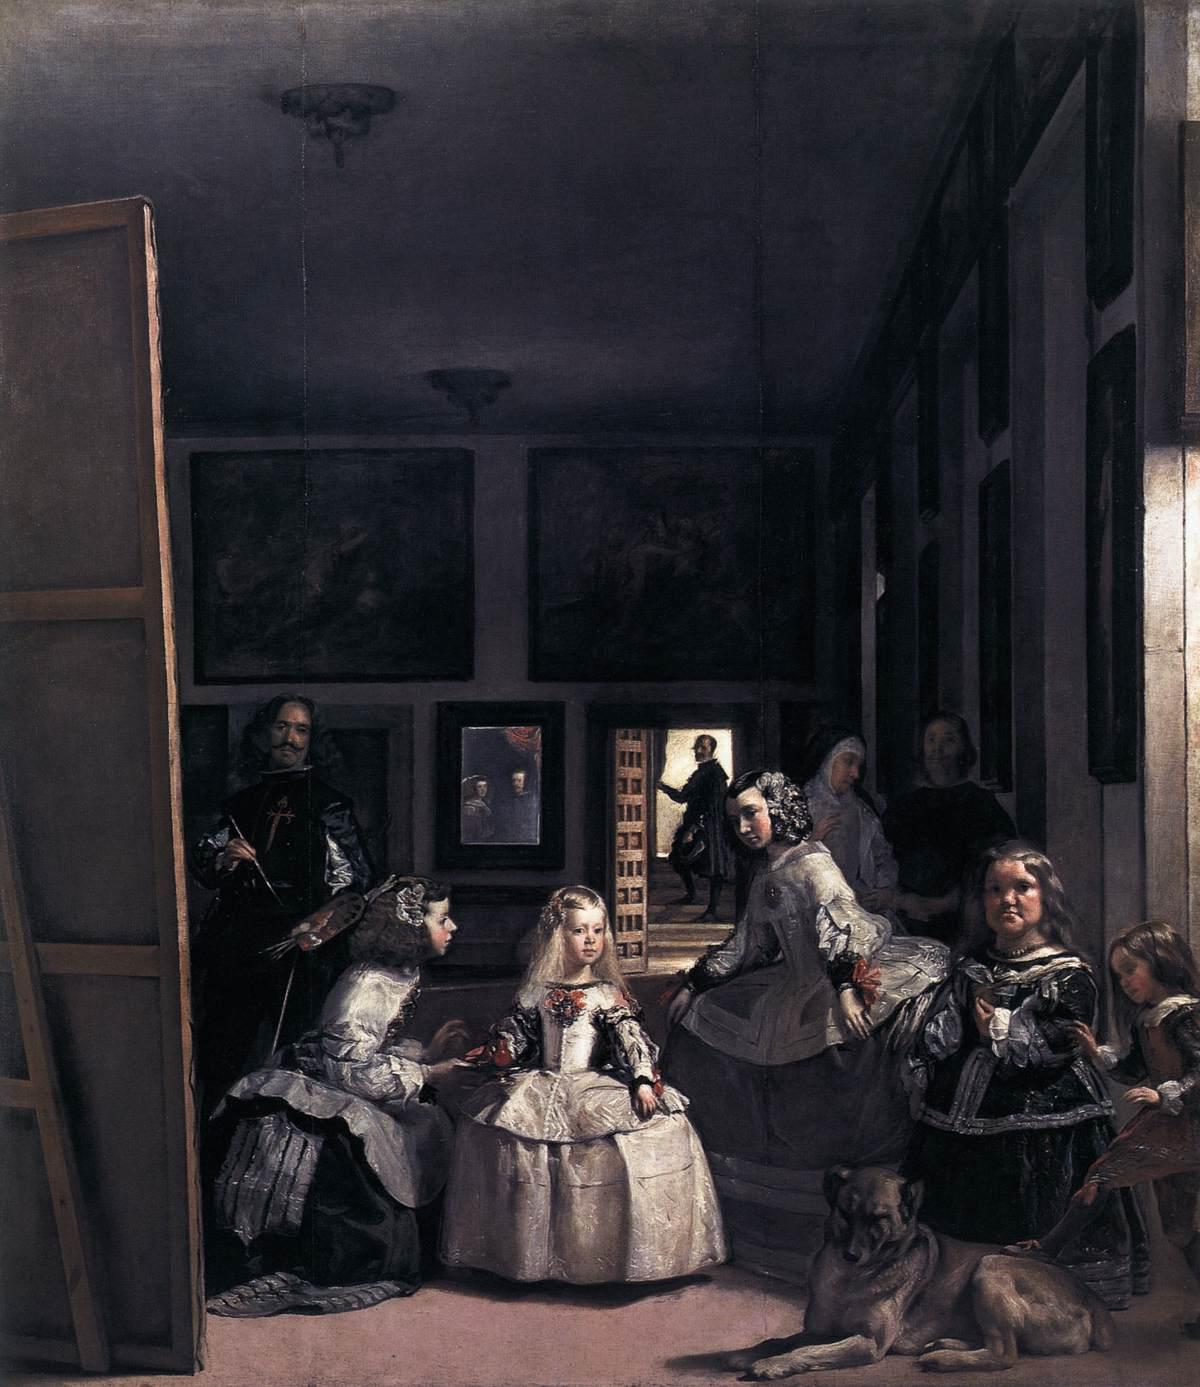 Las Meninas or The Family of Philip IV (1656-57)